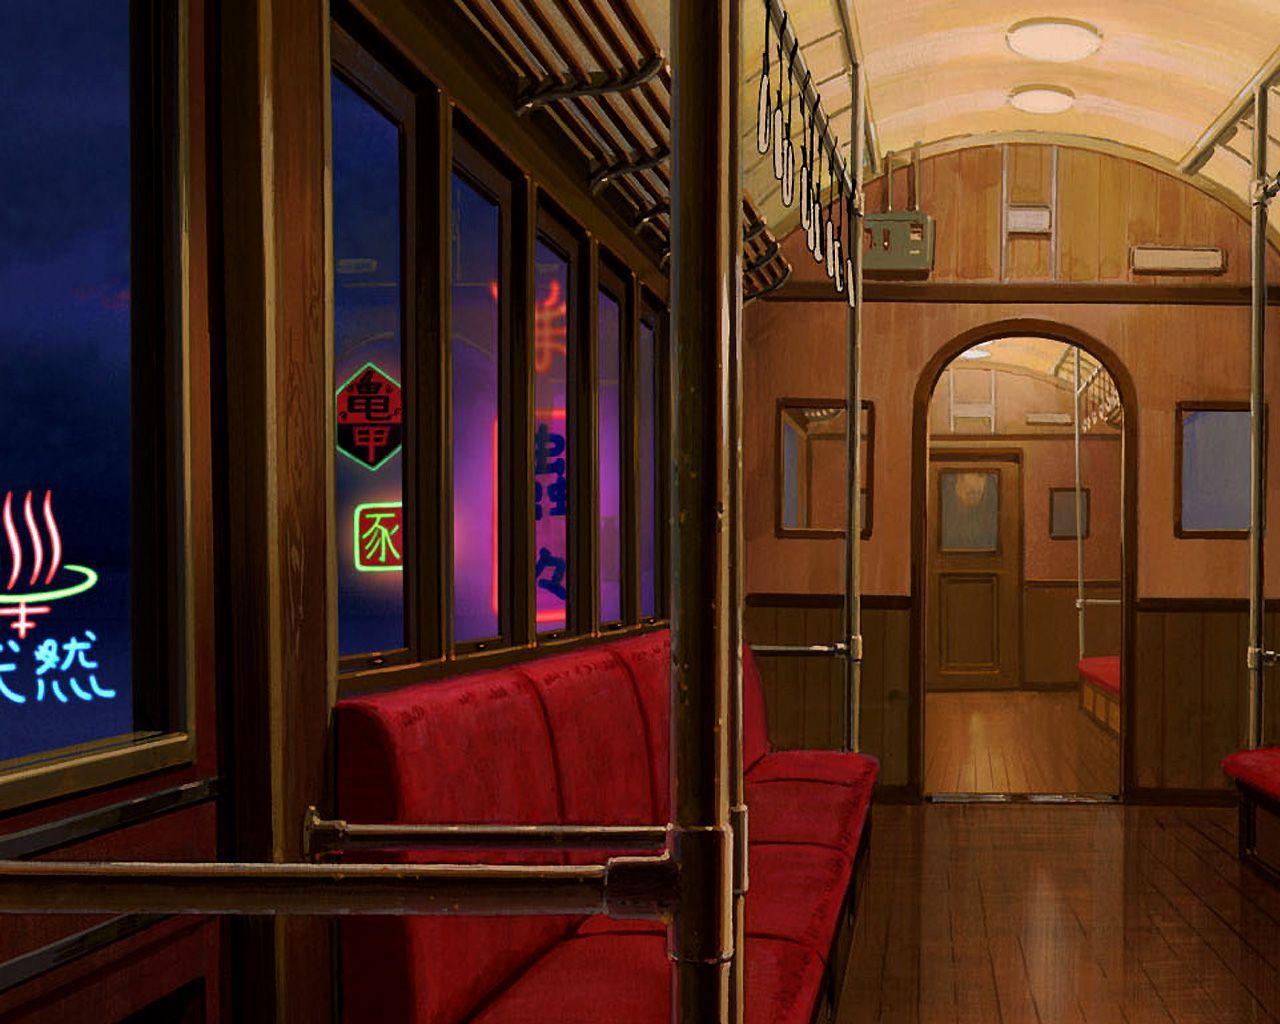 Spirited Away Wallpaper Train Wallpapers For Desktop And Mobile Spirited Away Wallpaper Studio Ghibli Background Studio Ghibli